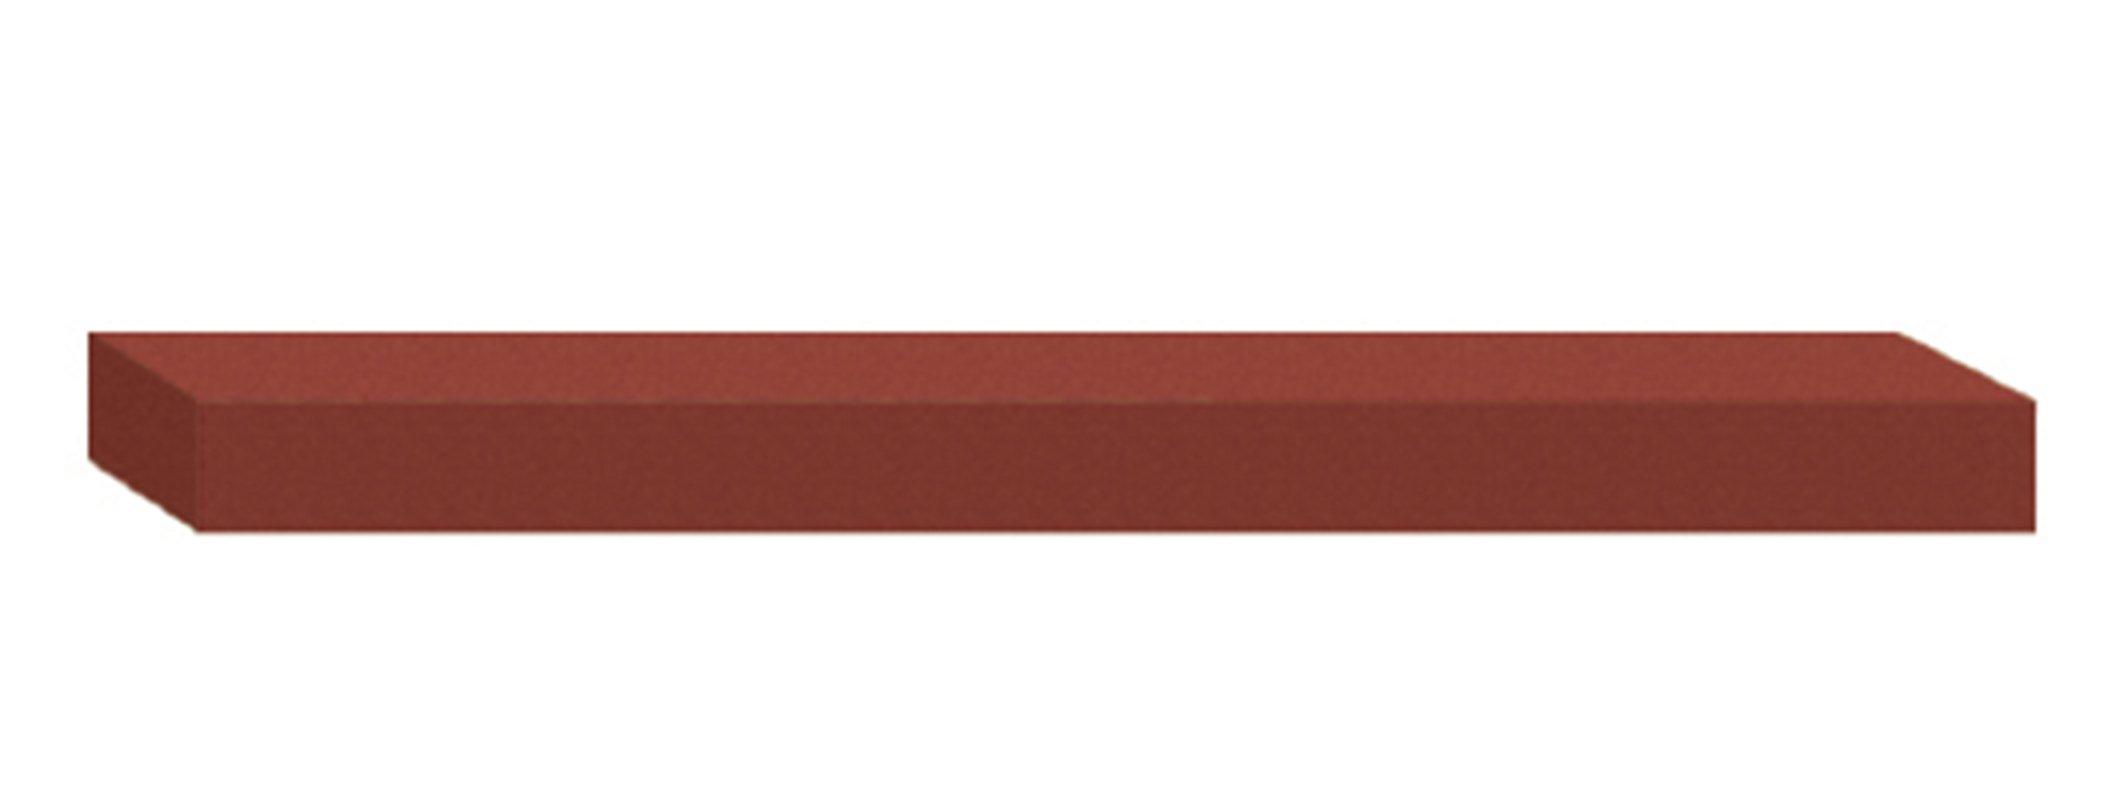 Dedeco 0209 Rubberized Abrasive